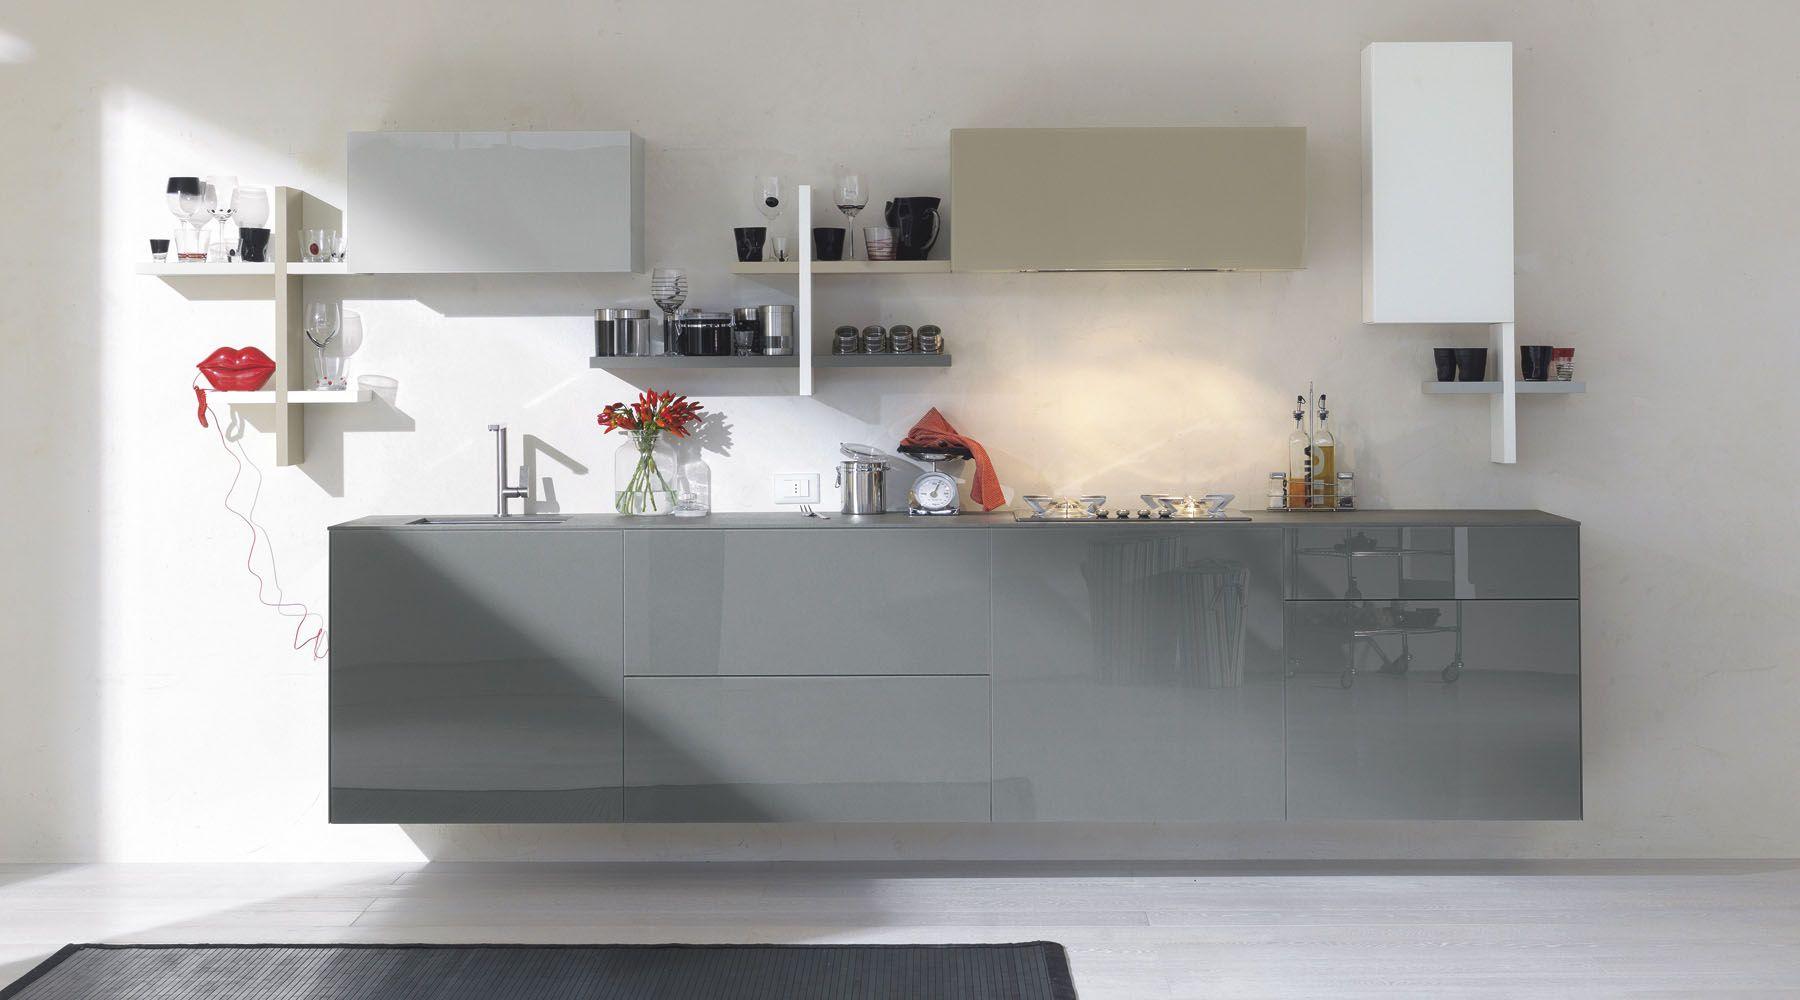 Cucina 36e8 design cucine kitchen kitchen design italian furniture - Cucine sospese da terra ...